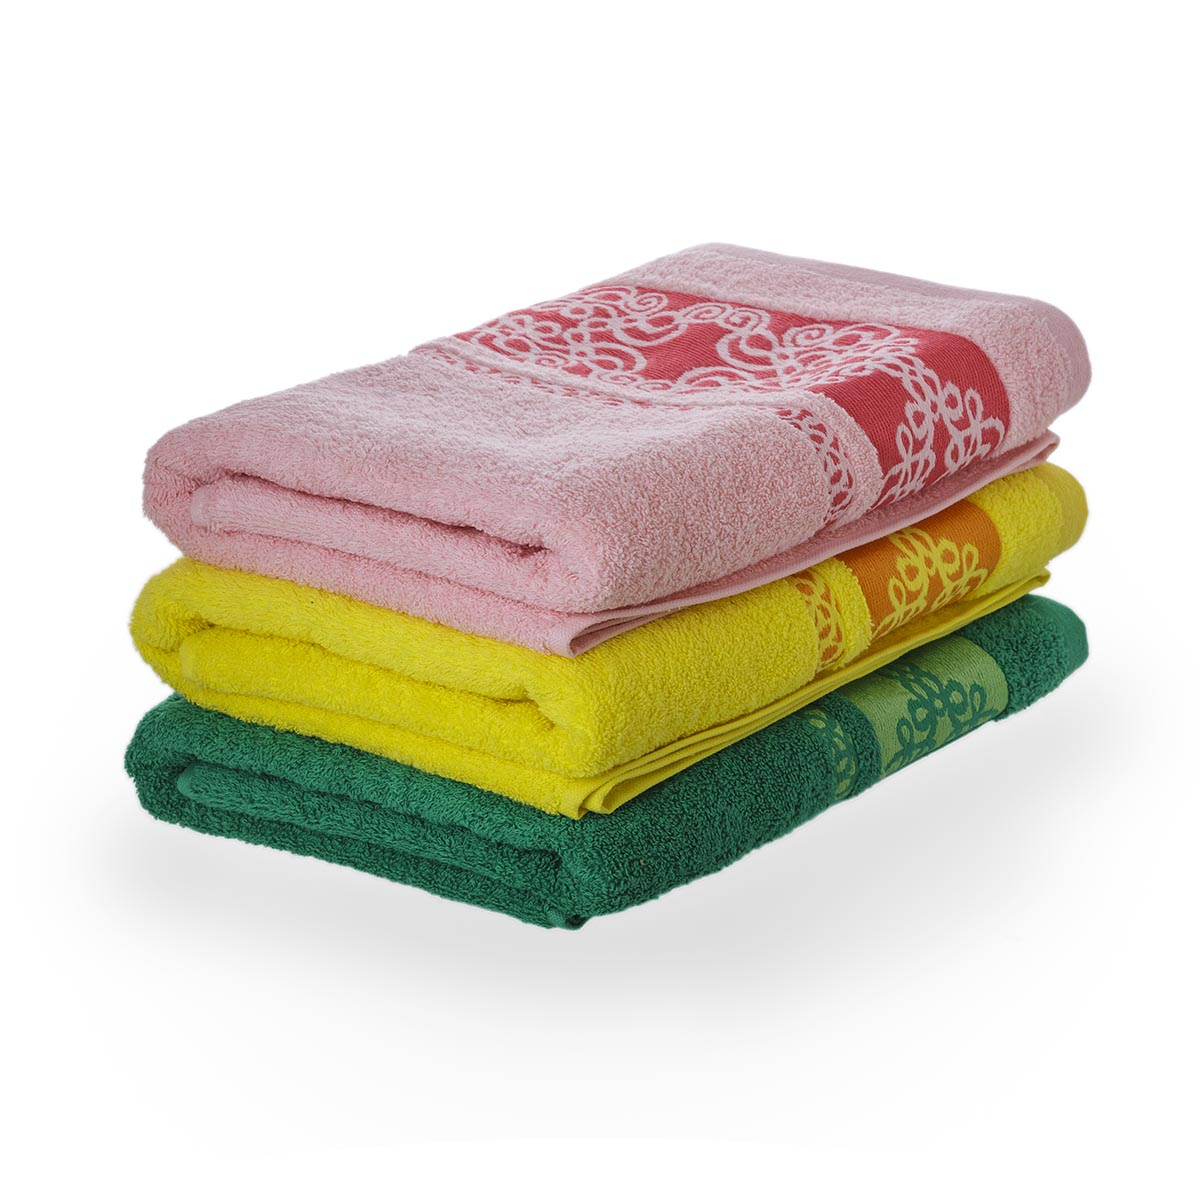 Полотенце Узор, цвет Зеленый, размер 50х90 смМахровые полотенца<br>Плотность ткани:420 г/кв. м.<br><br>Тип: Полотенце<br>Размер: 50х90<br>Материал: Махра